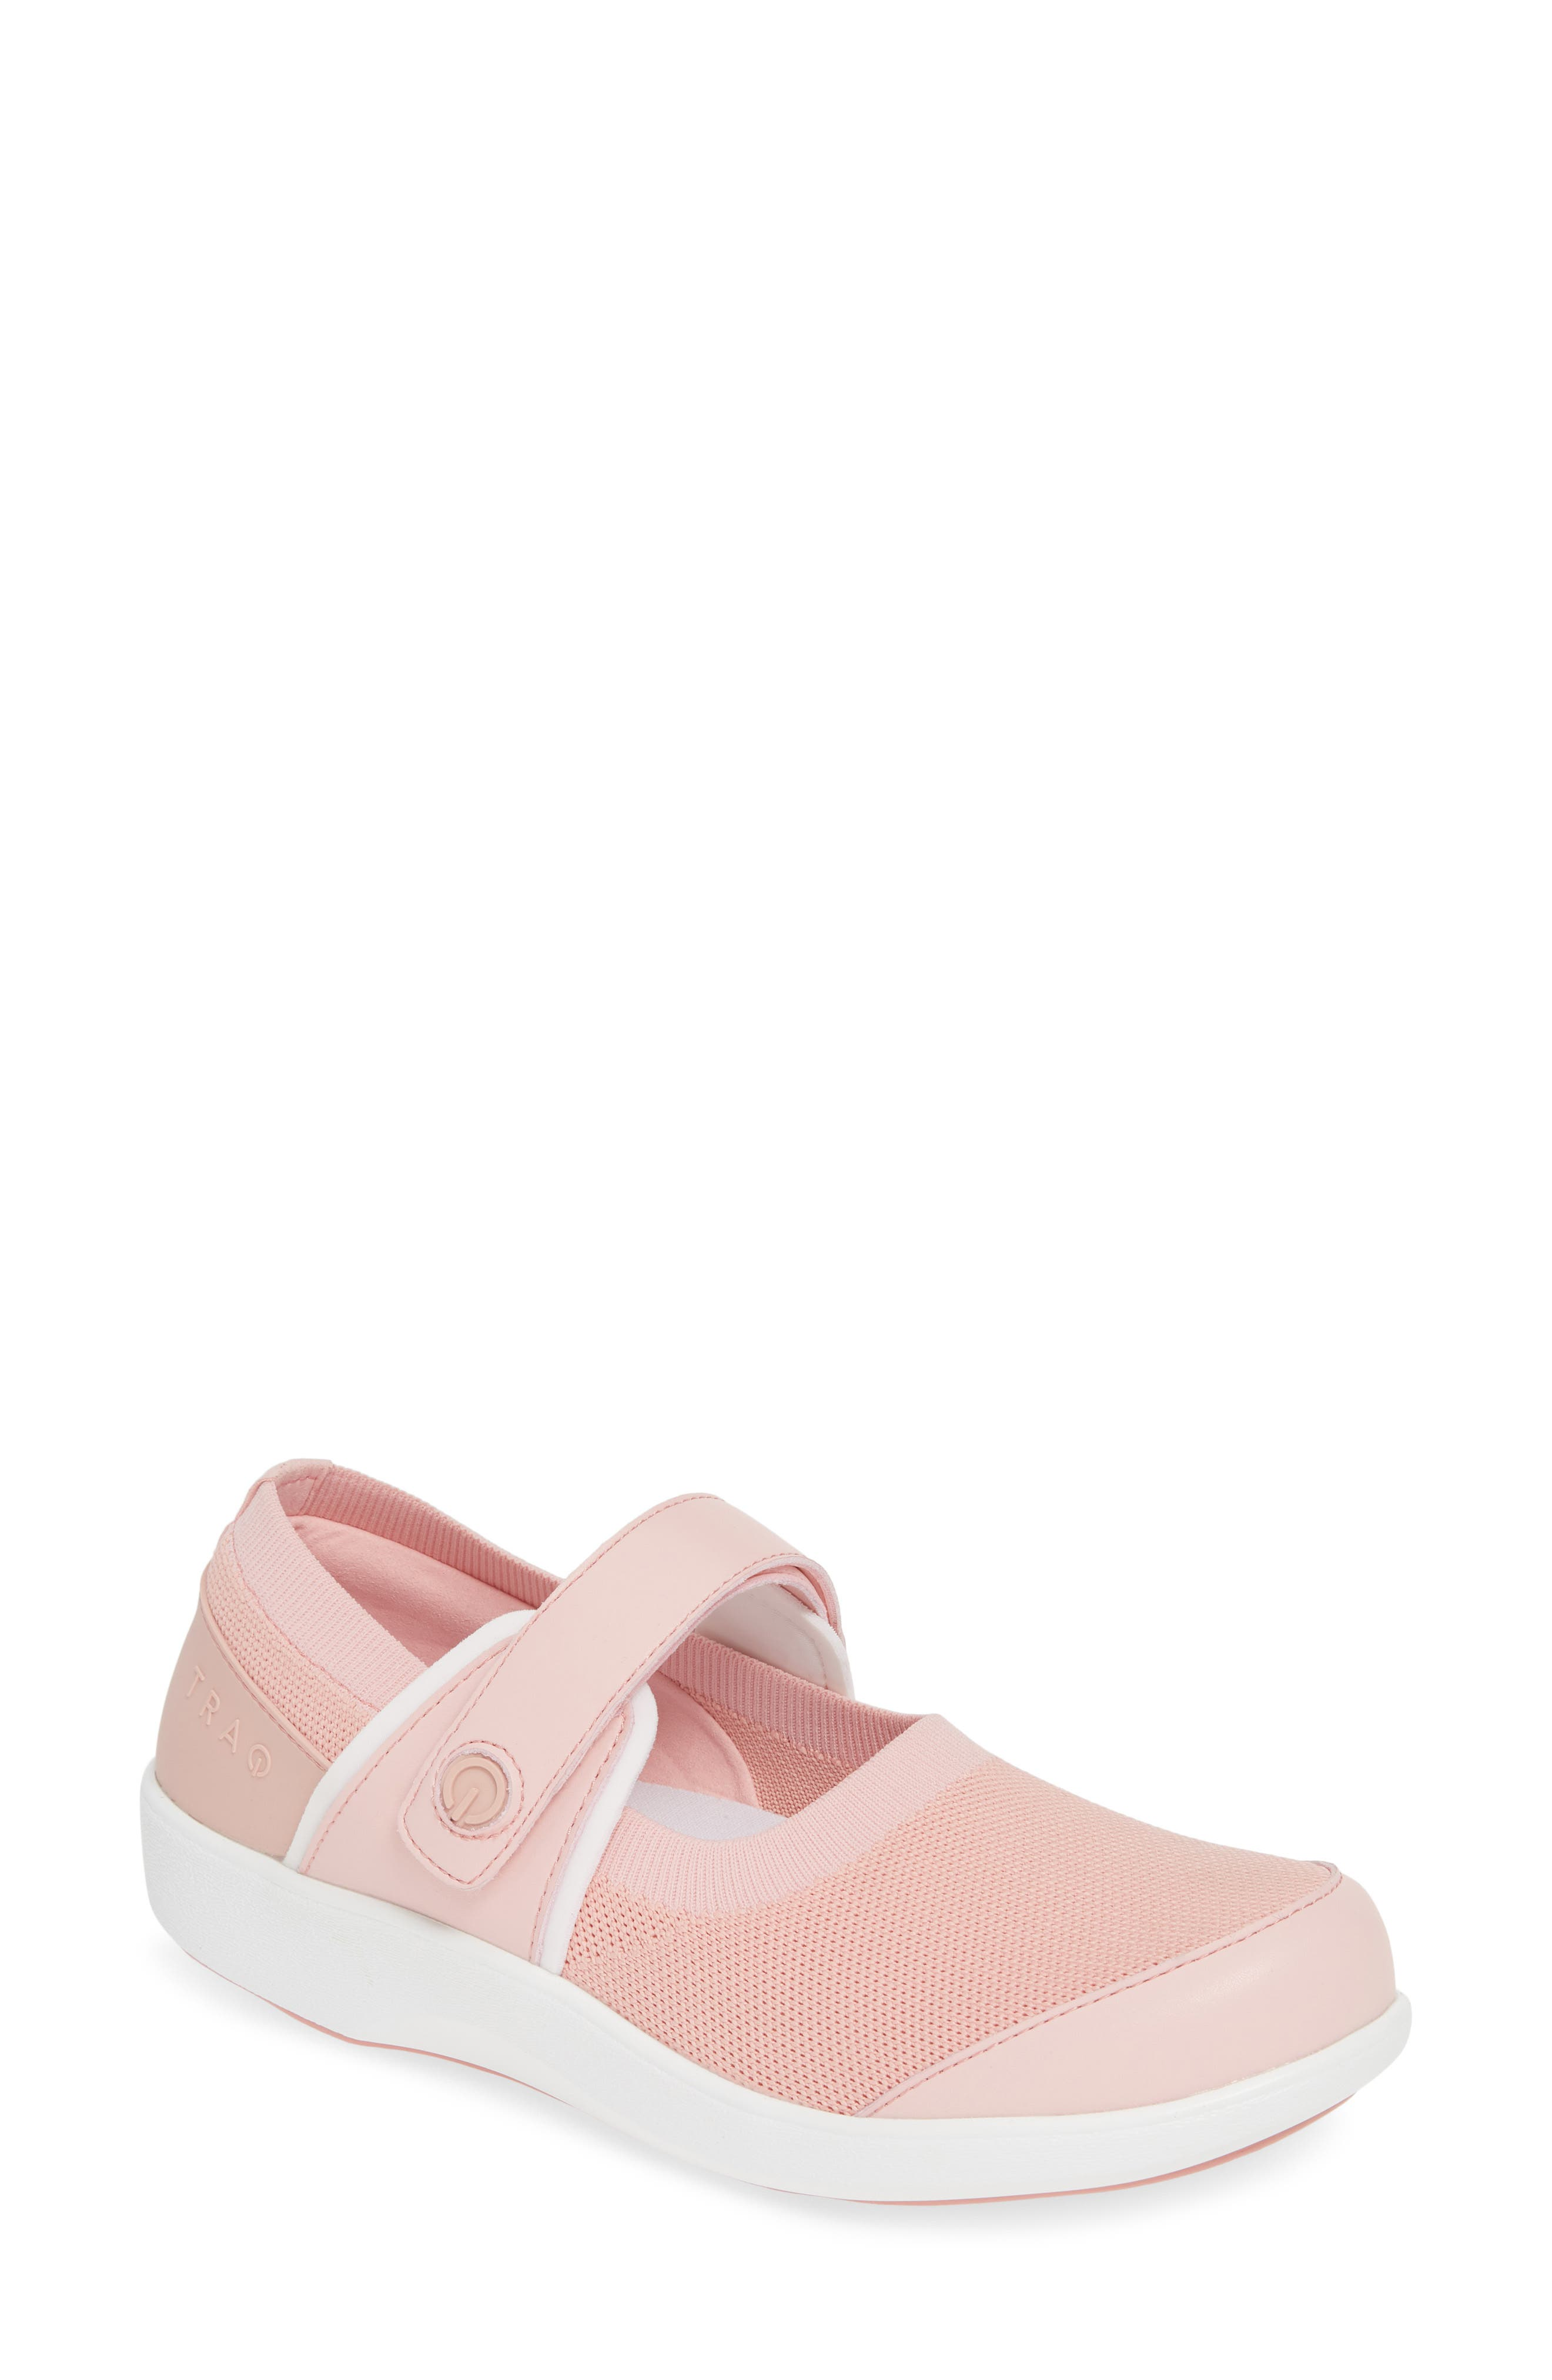 Alegria Qutie Mary Jane Flat - Pink